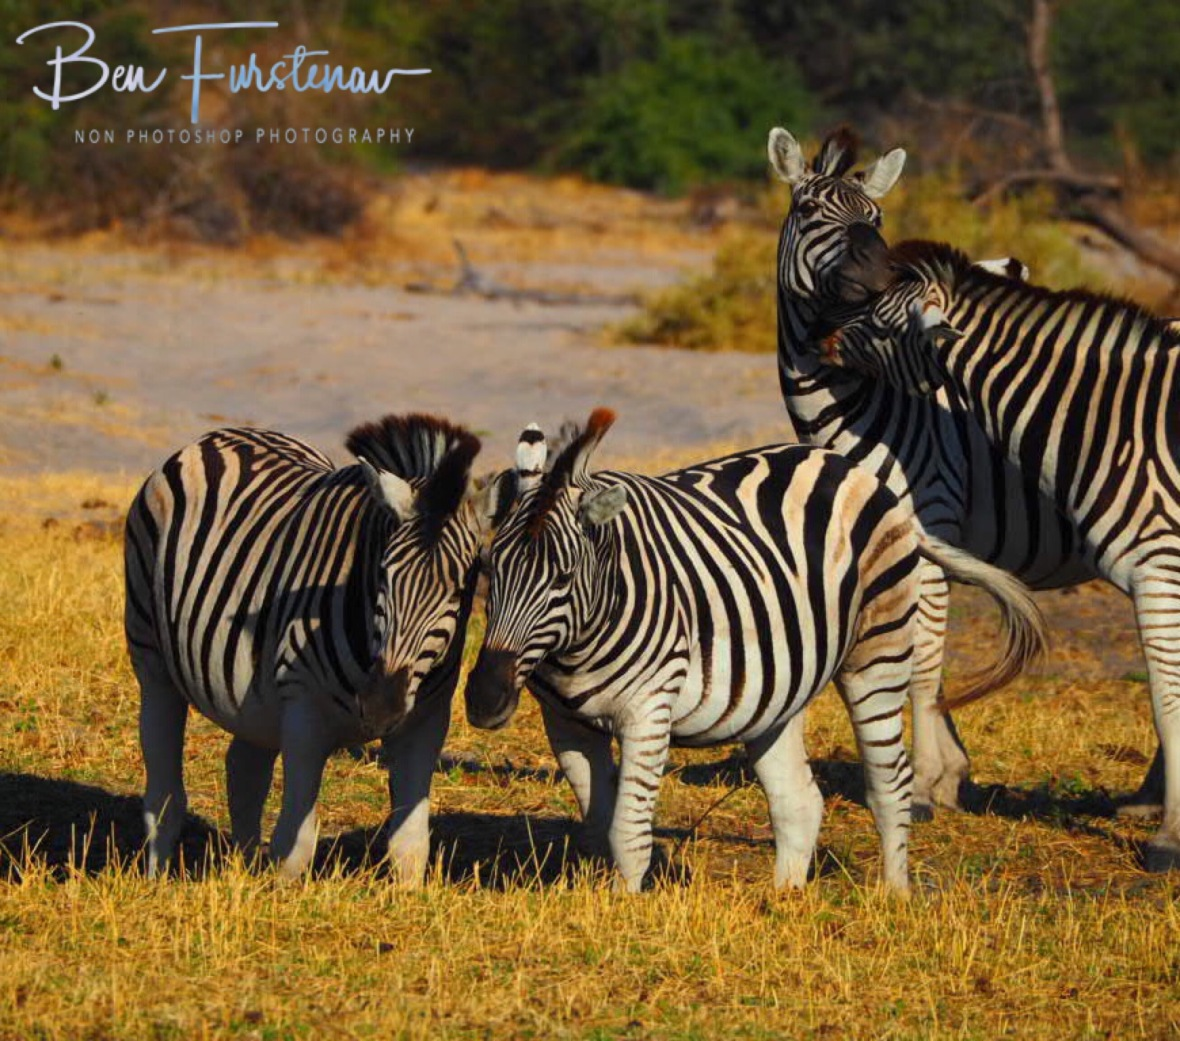 Friendly tussle, Makgadikgadi National Park, Botswana